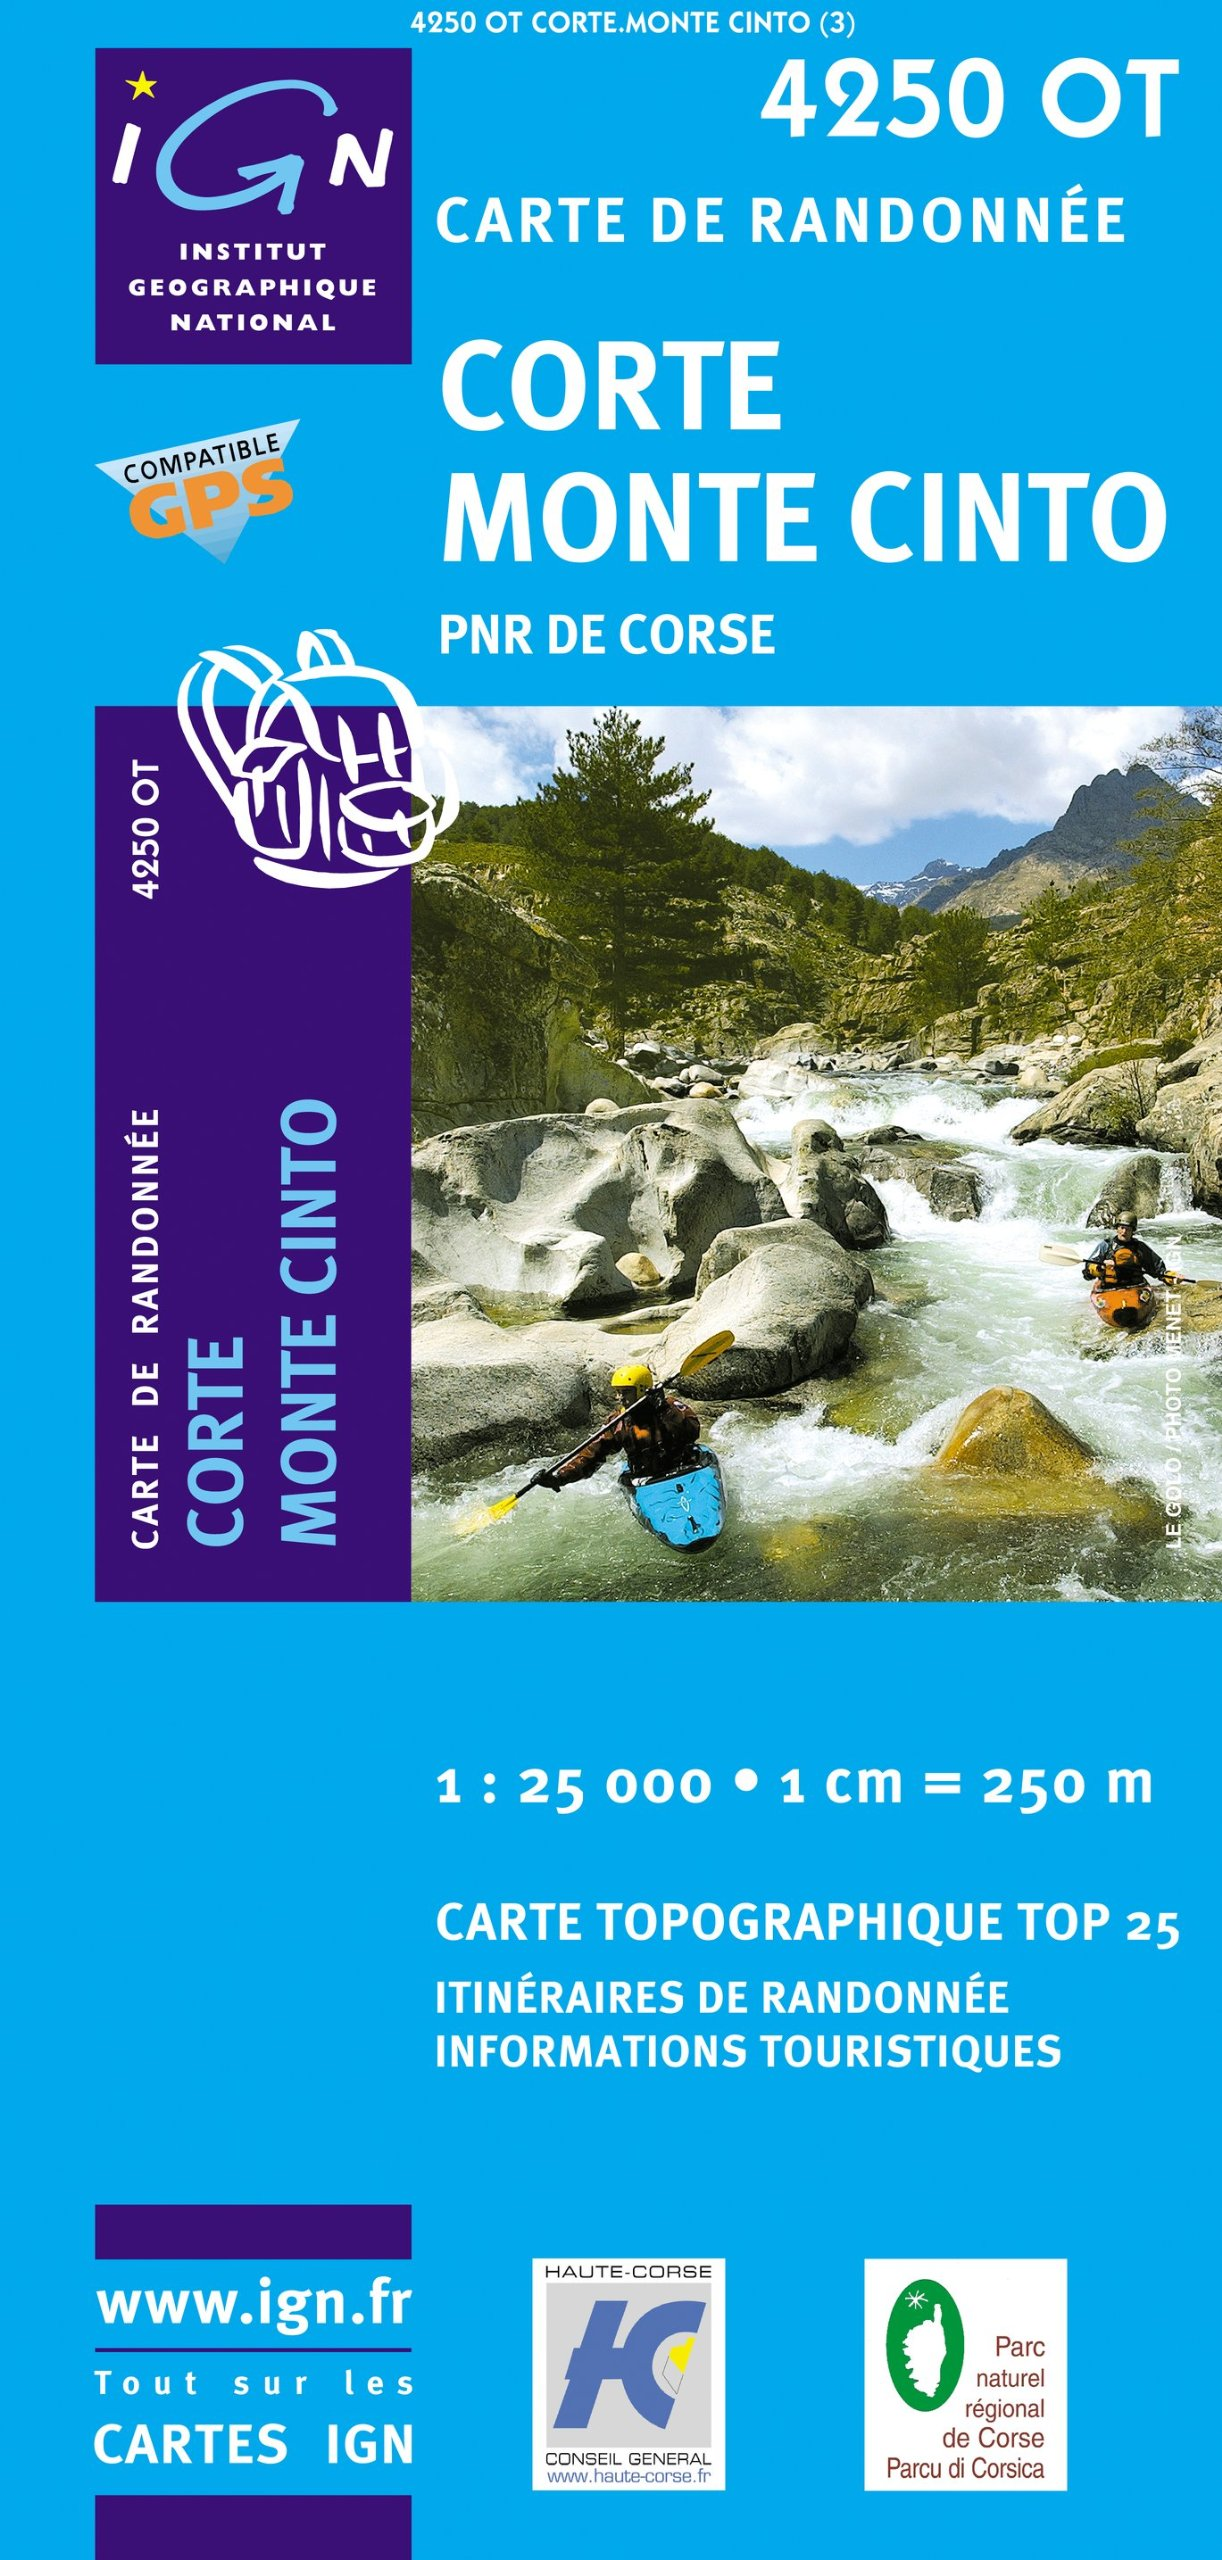 Korsika Corte - Monte Cinto - Parque National de la Corse 1 : 25 000: Carte de Randonnée